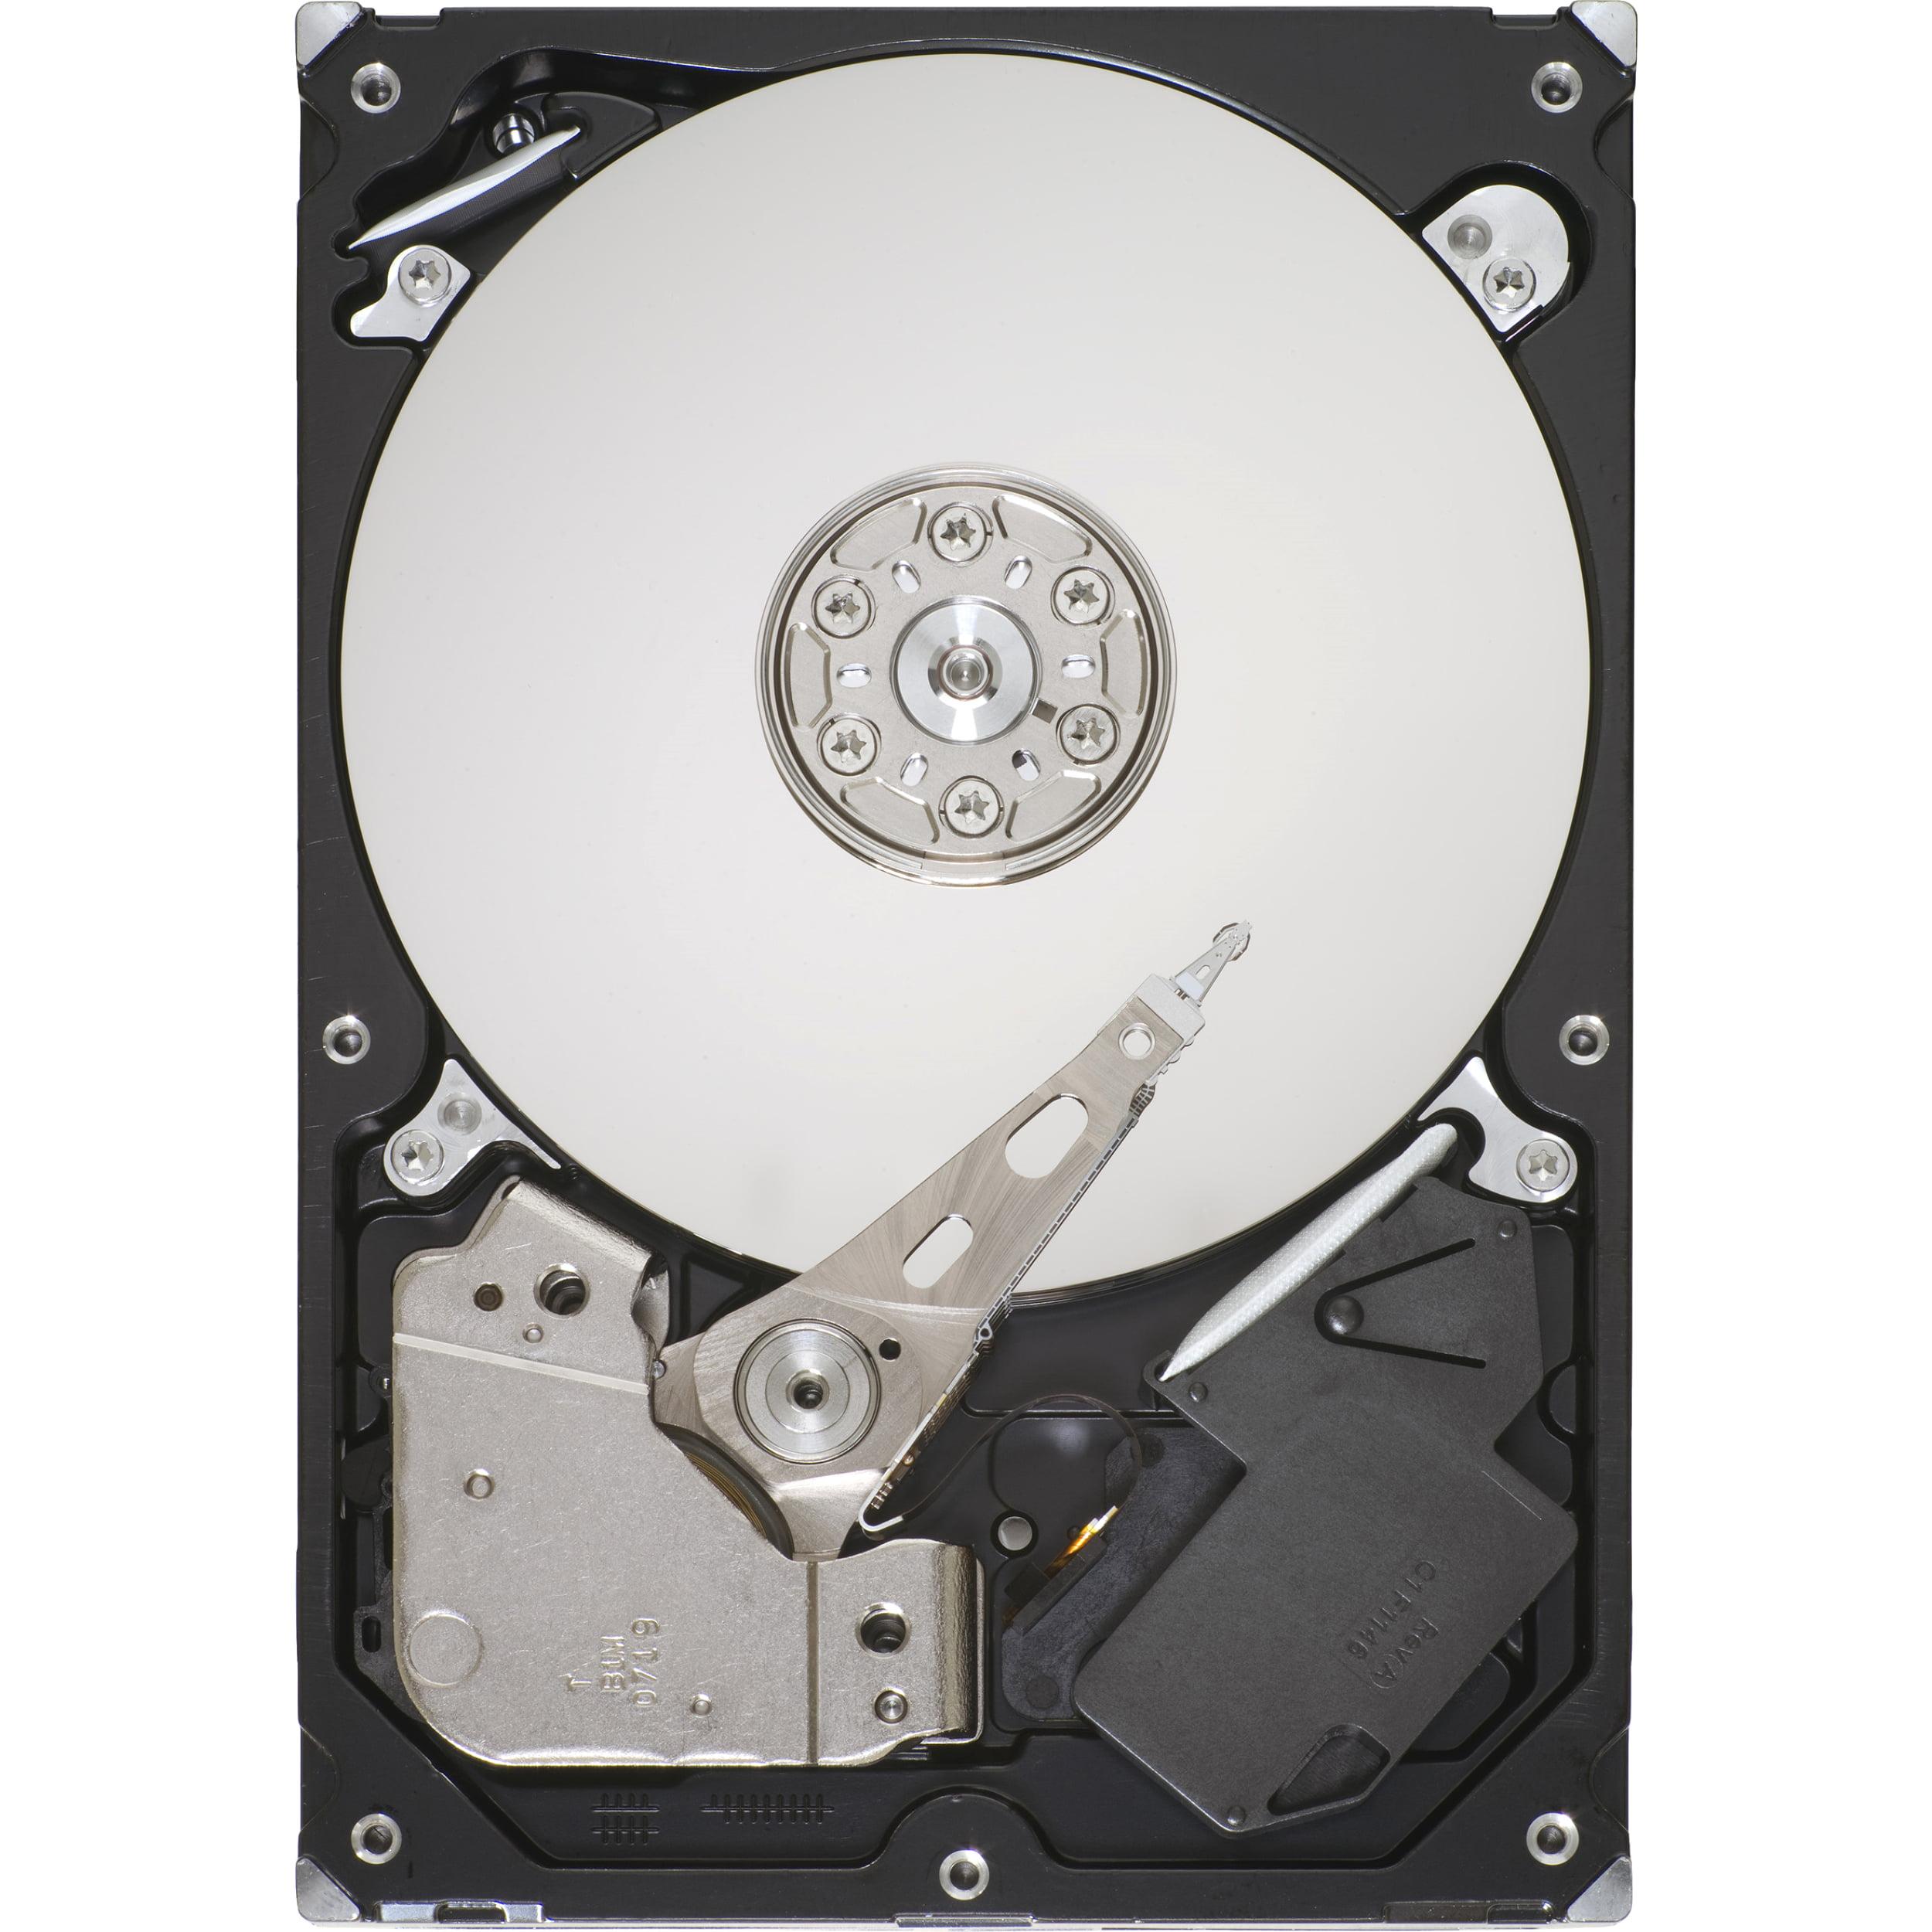 Seagate ST31000524AS 1TB 7.2K SATA 6Gb/s 3.5in Hard Drive